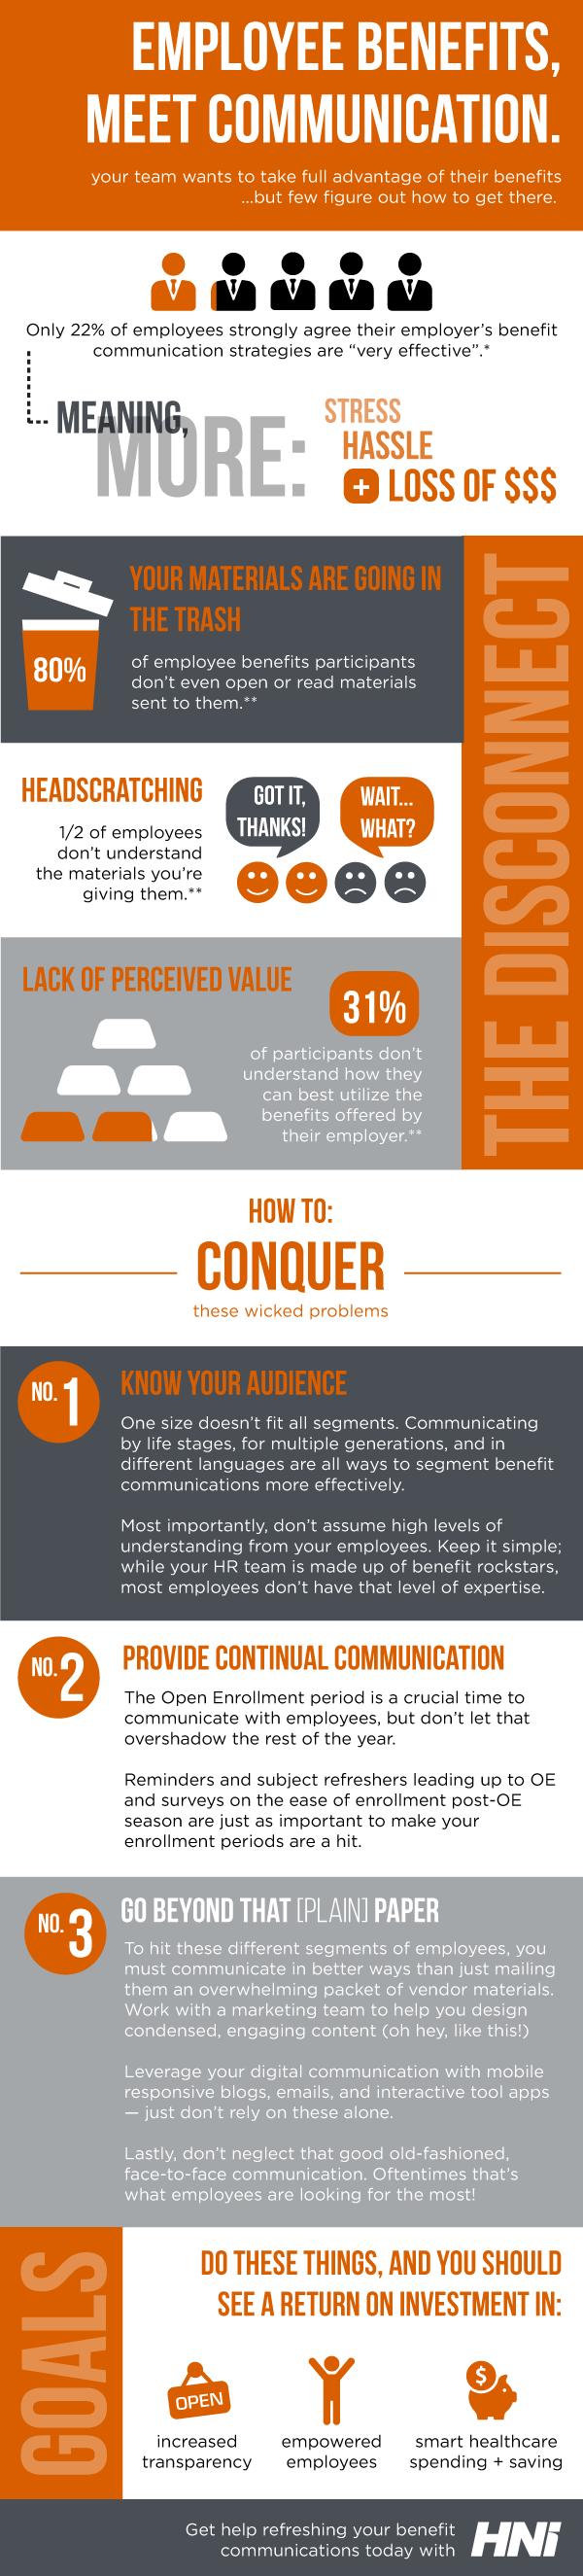 HNI-Benefits-Infographic-Blog-1.png